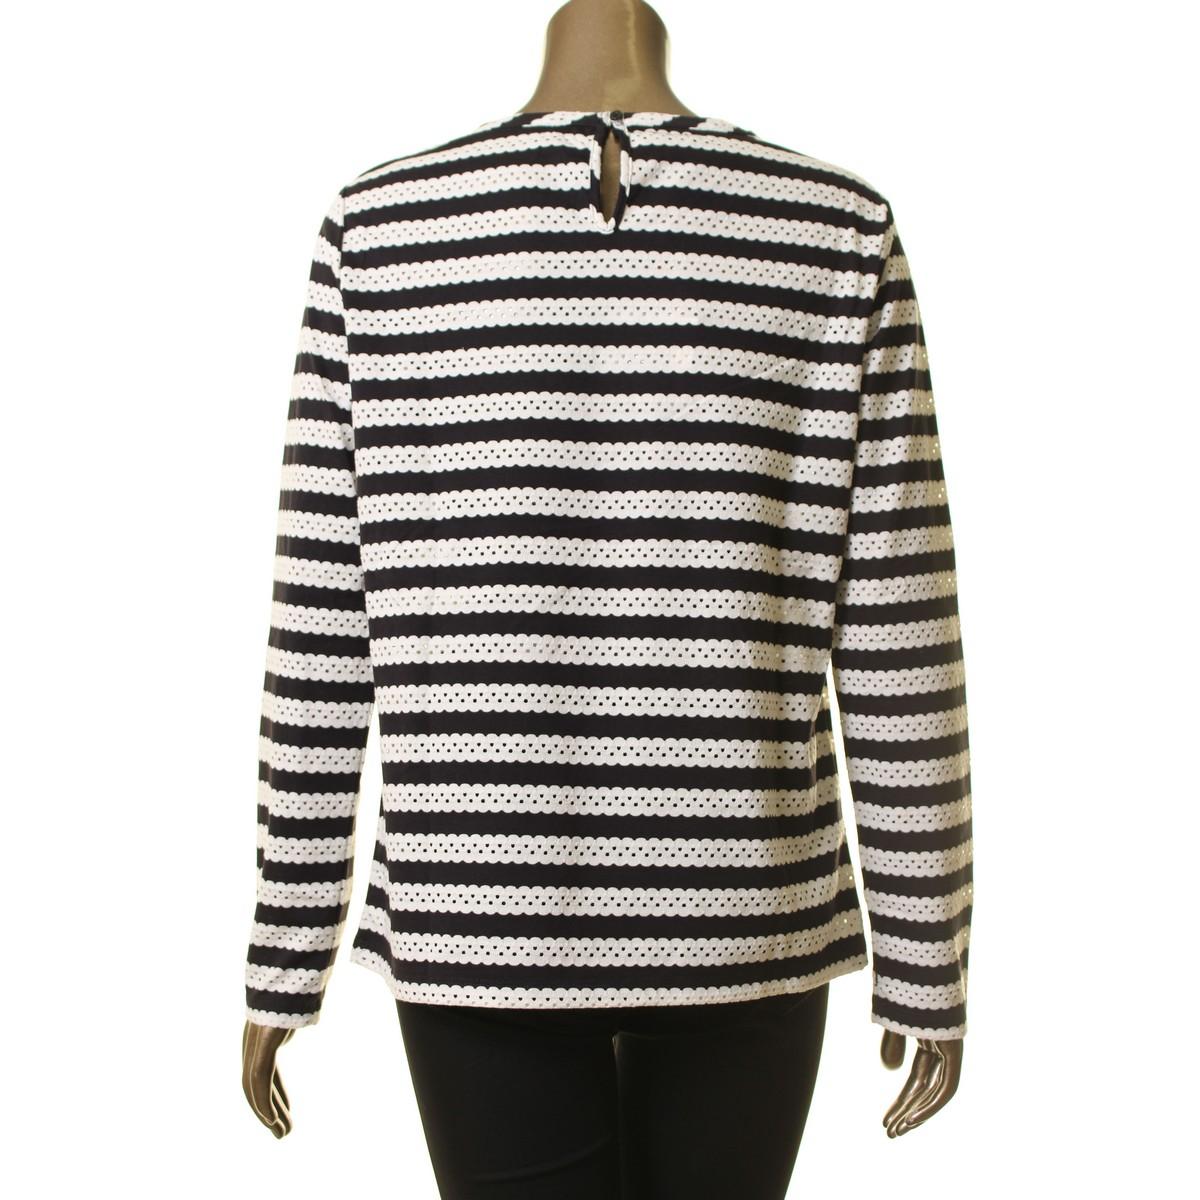 ANNE-KLEIN-NEW-Women-039-s-Eyelet-Striped-Casual-Shirt-Top-TEDO thumbnail 10